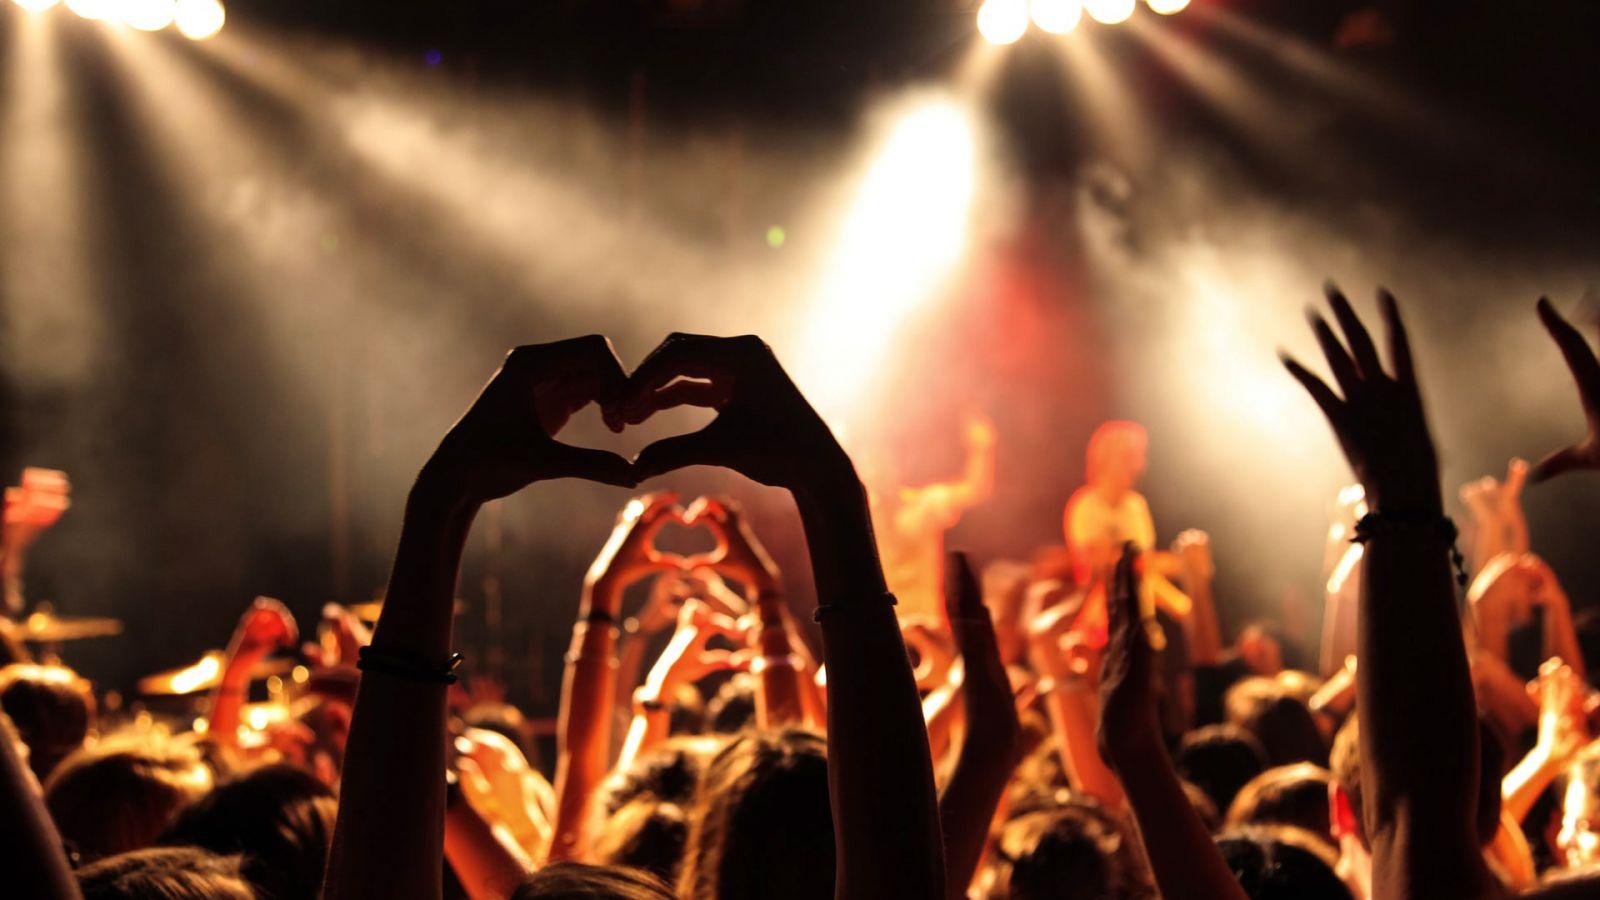 To Athens Music Week στην Τεχνόπολη γιορτάζει την Ευρωπαϊκή Γιορτή της Μουσικής